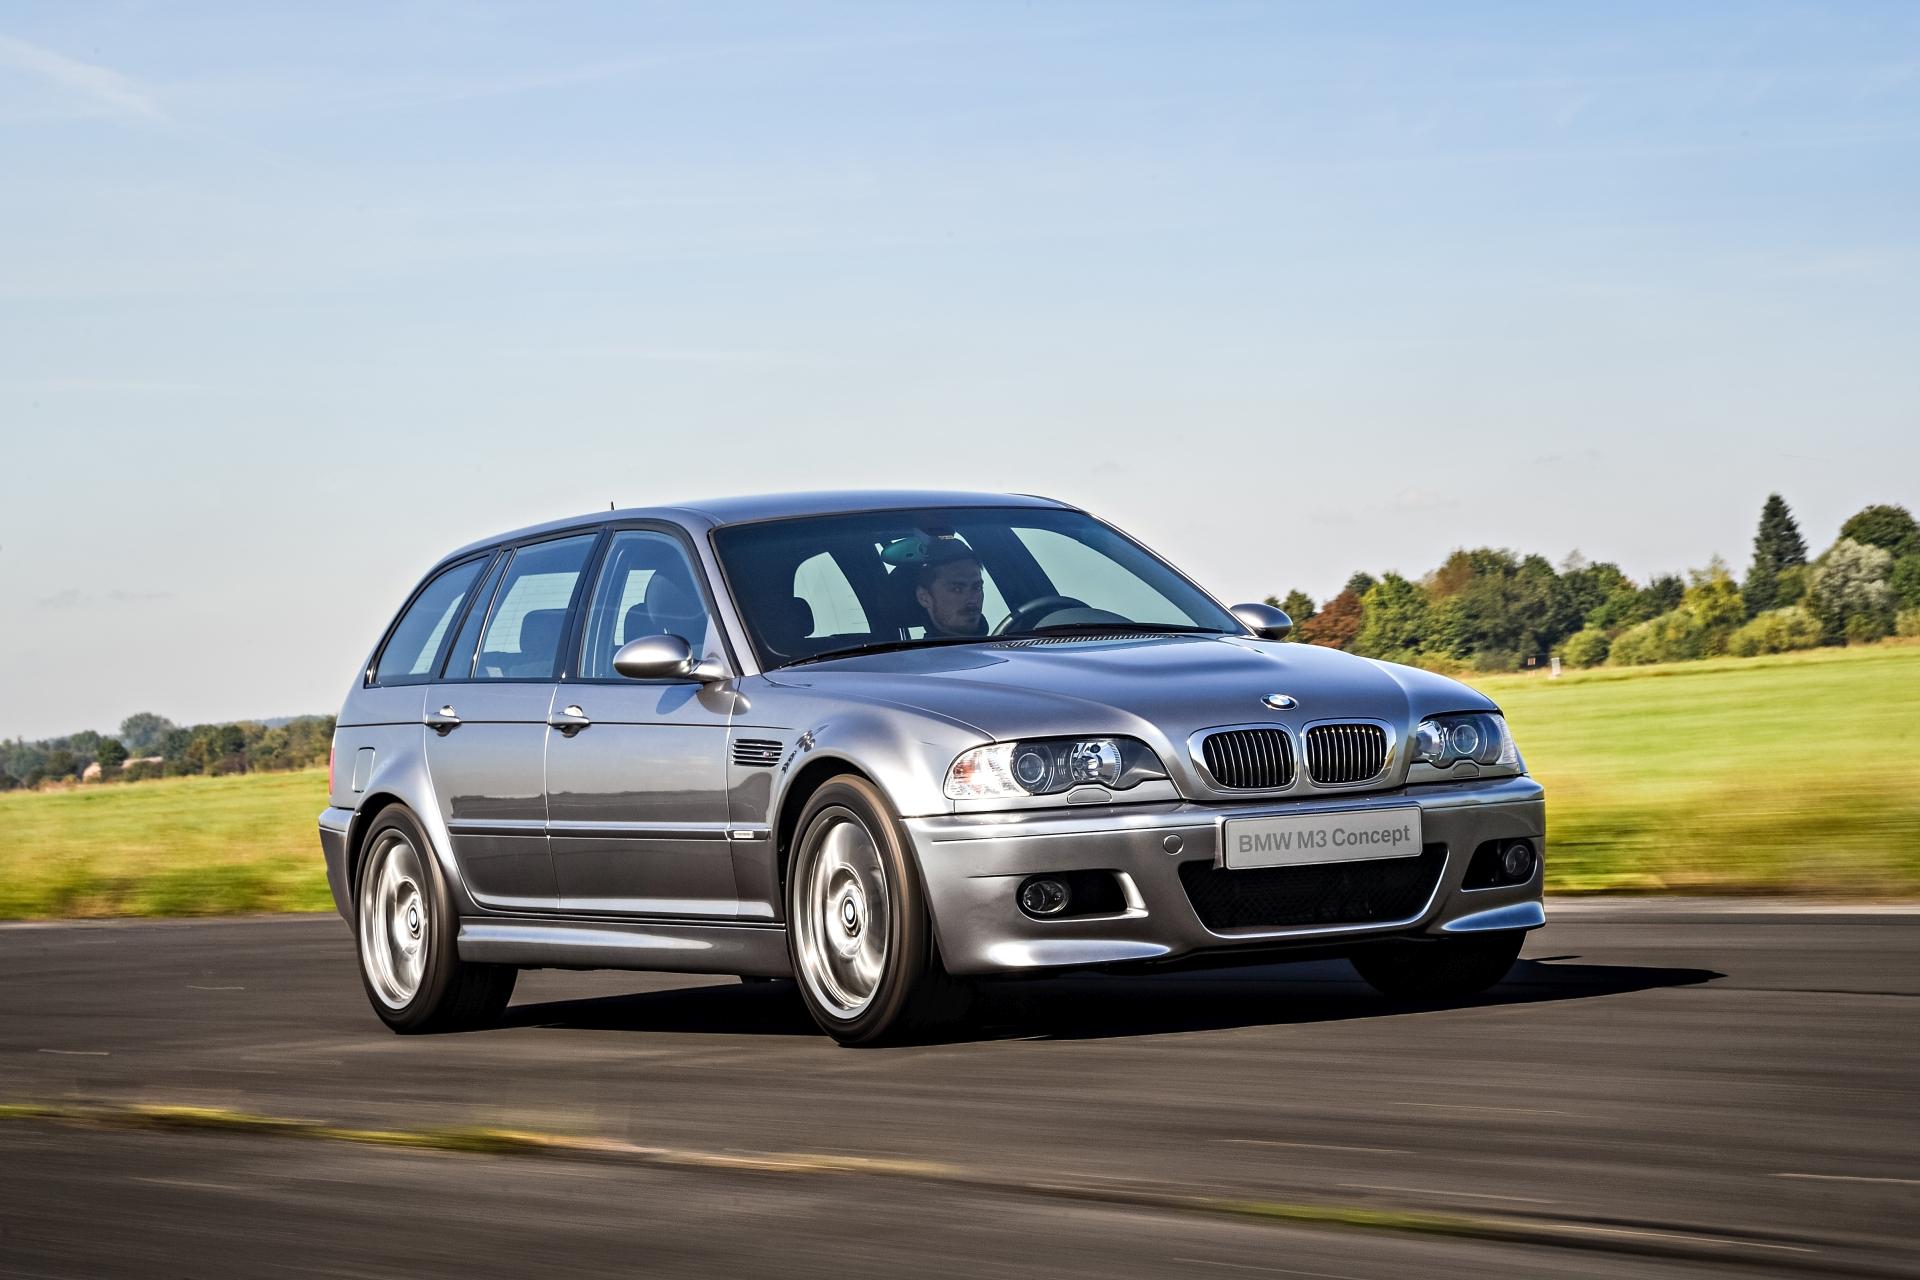 Secret BMW M369